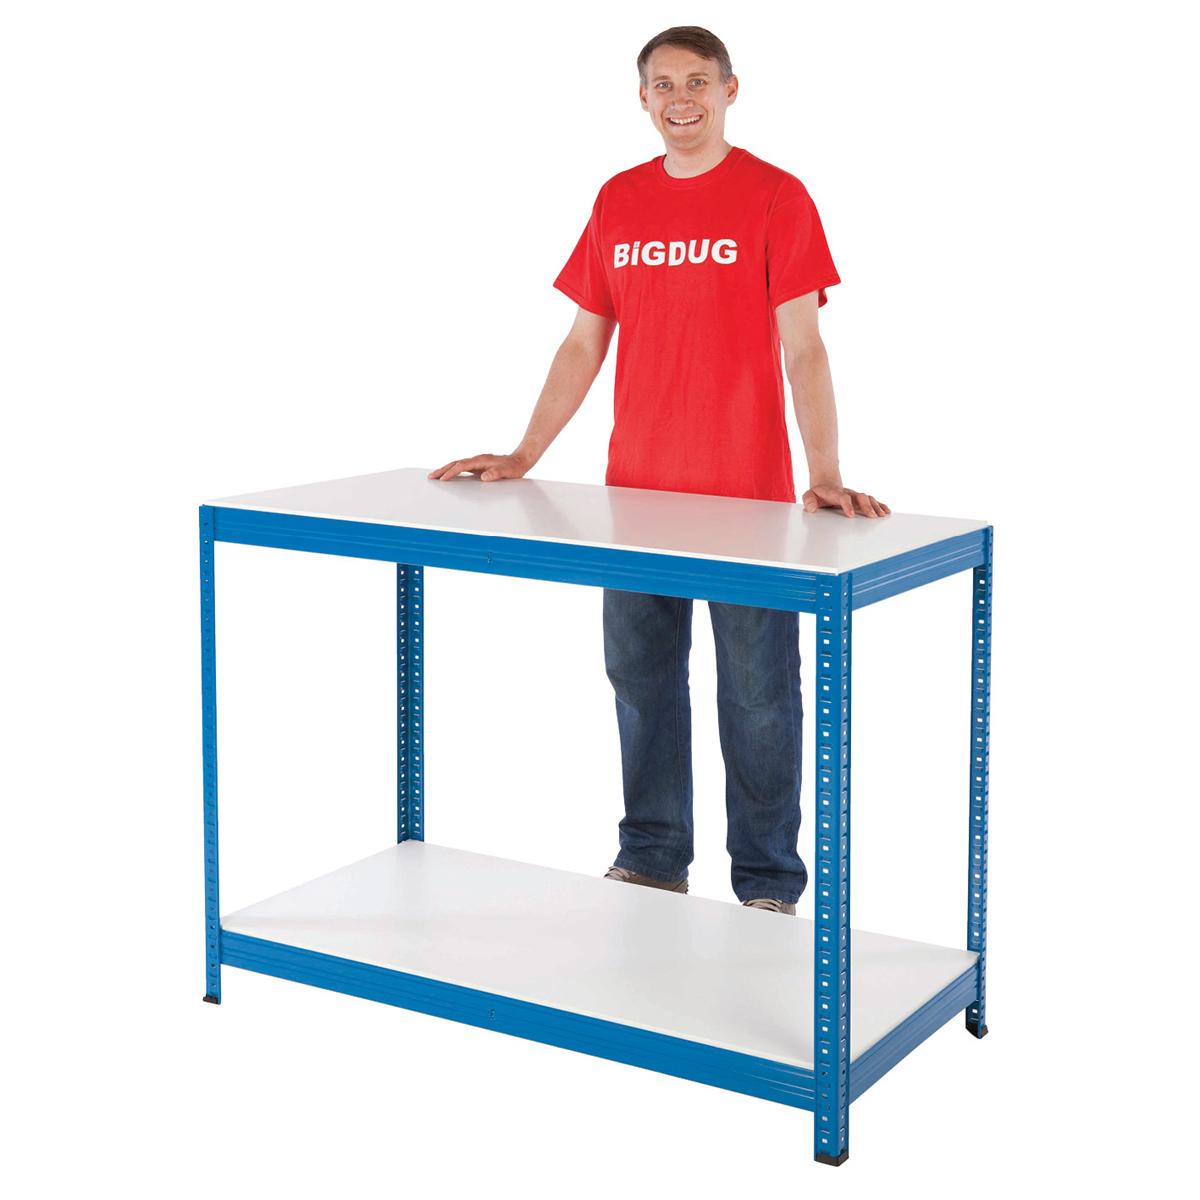 Garage Workbench Steel Bench 300kg Heavy Duty Work Station Storage Shelving Ebay